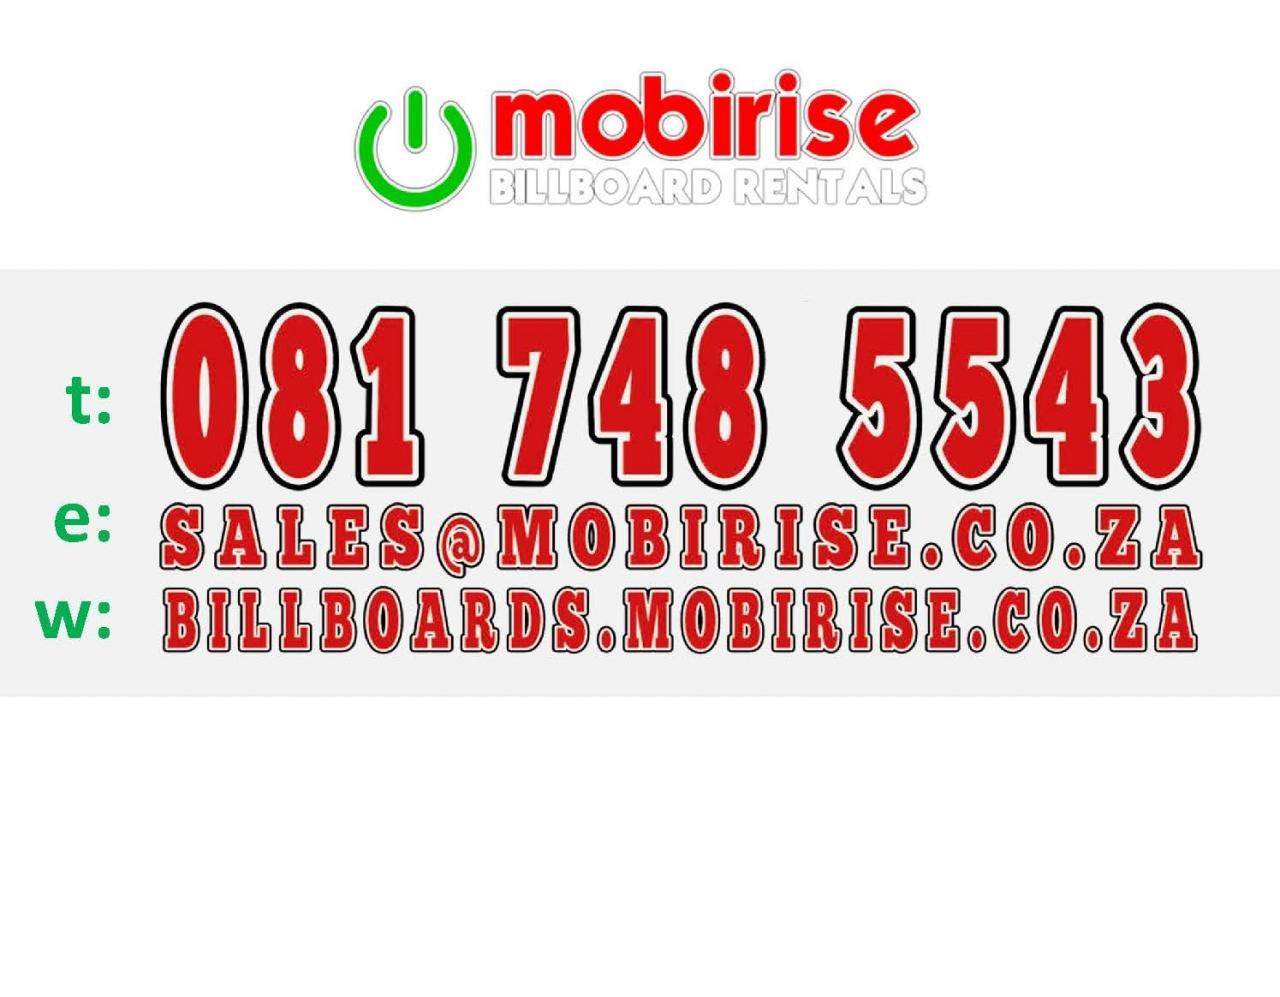 MOBIRISE BILLBOARD RENTALS - 75% EXPOSURE 4 ALL DISCOUNT SPECIALS3